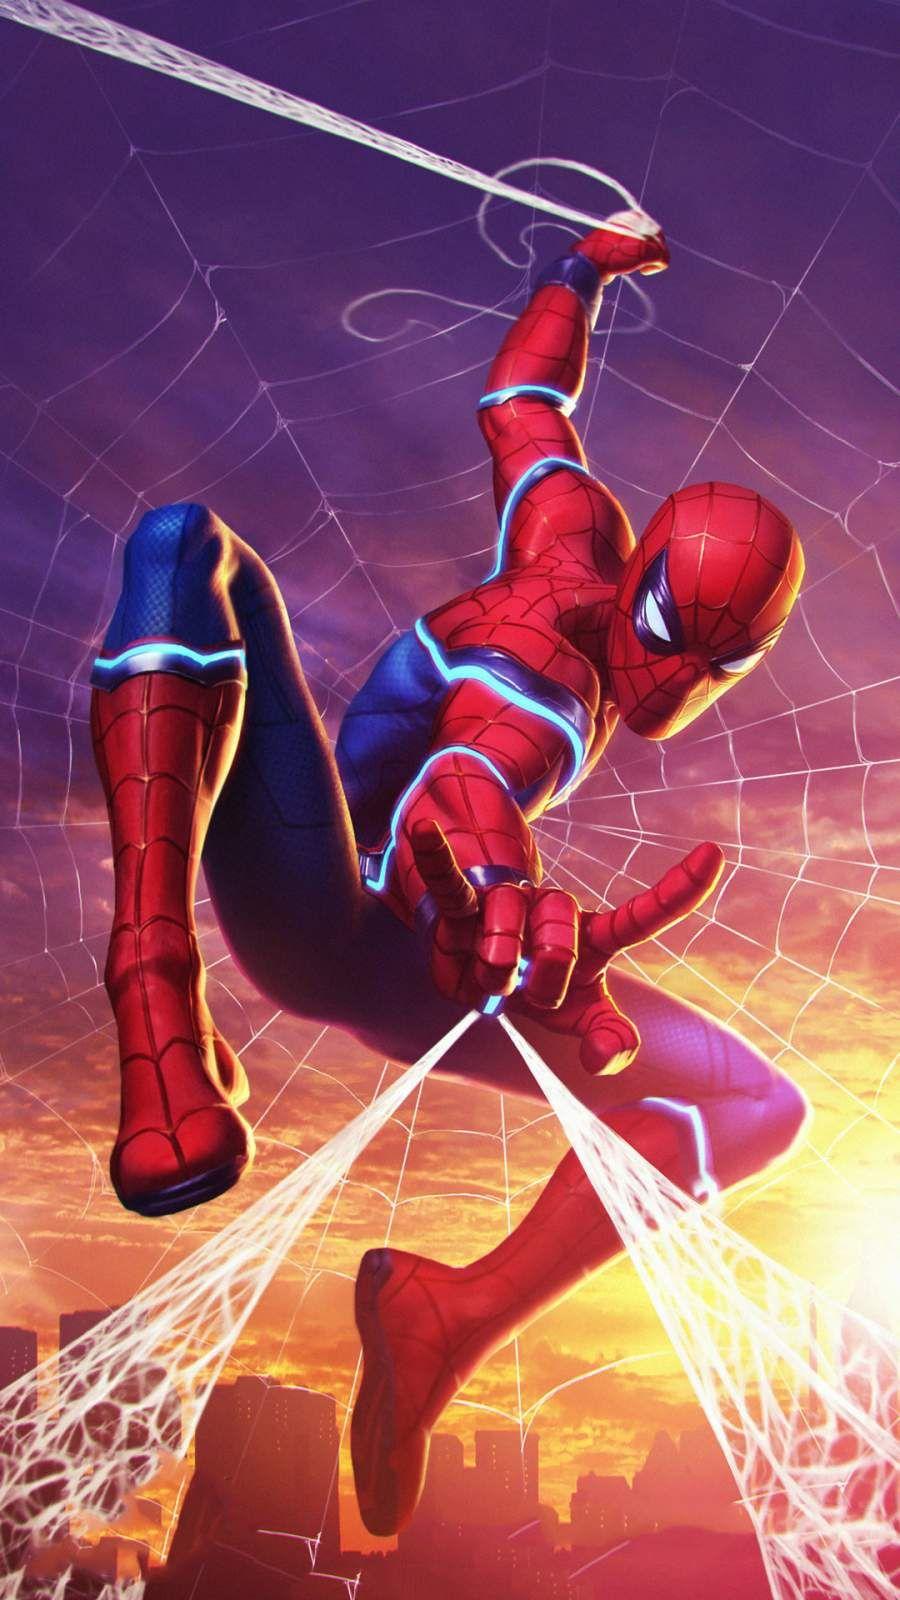 Future Spiderman Iphone Wallpaper Marvel Spiderman Art Spiderman Spiderman Pictures